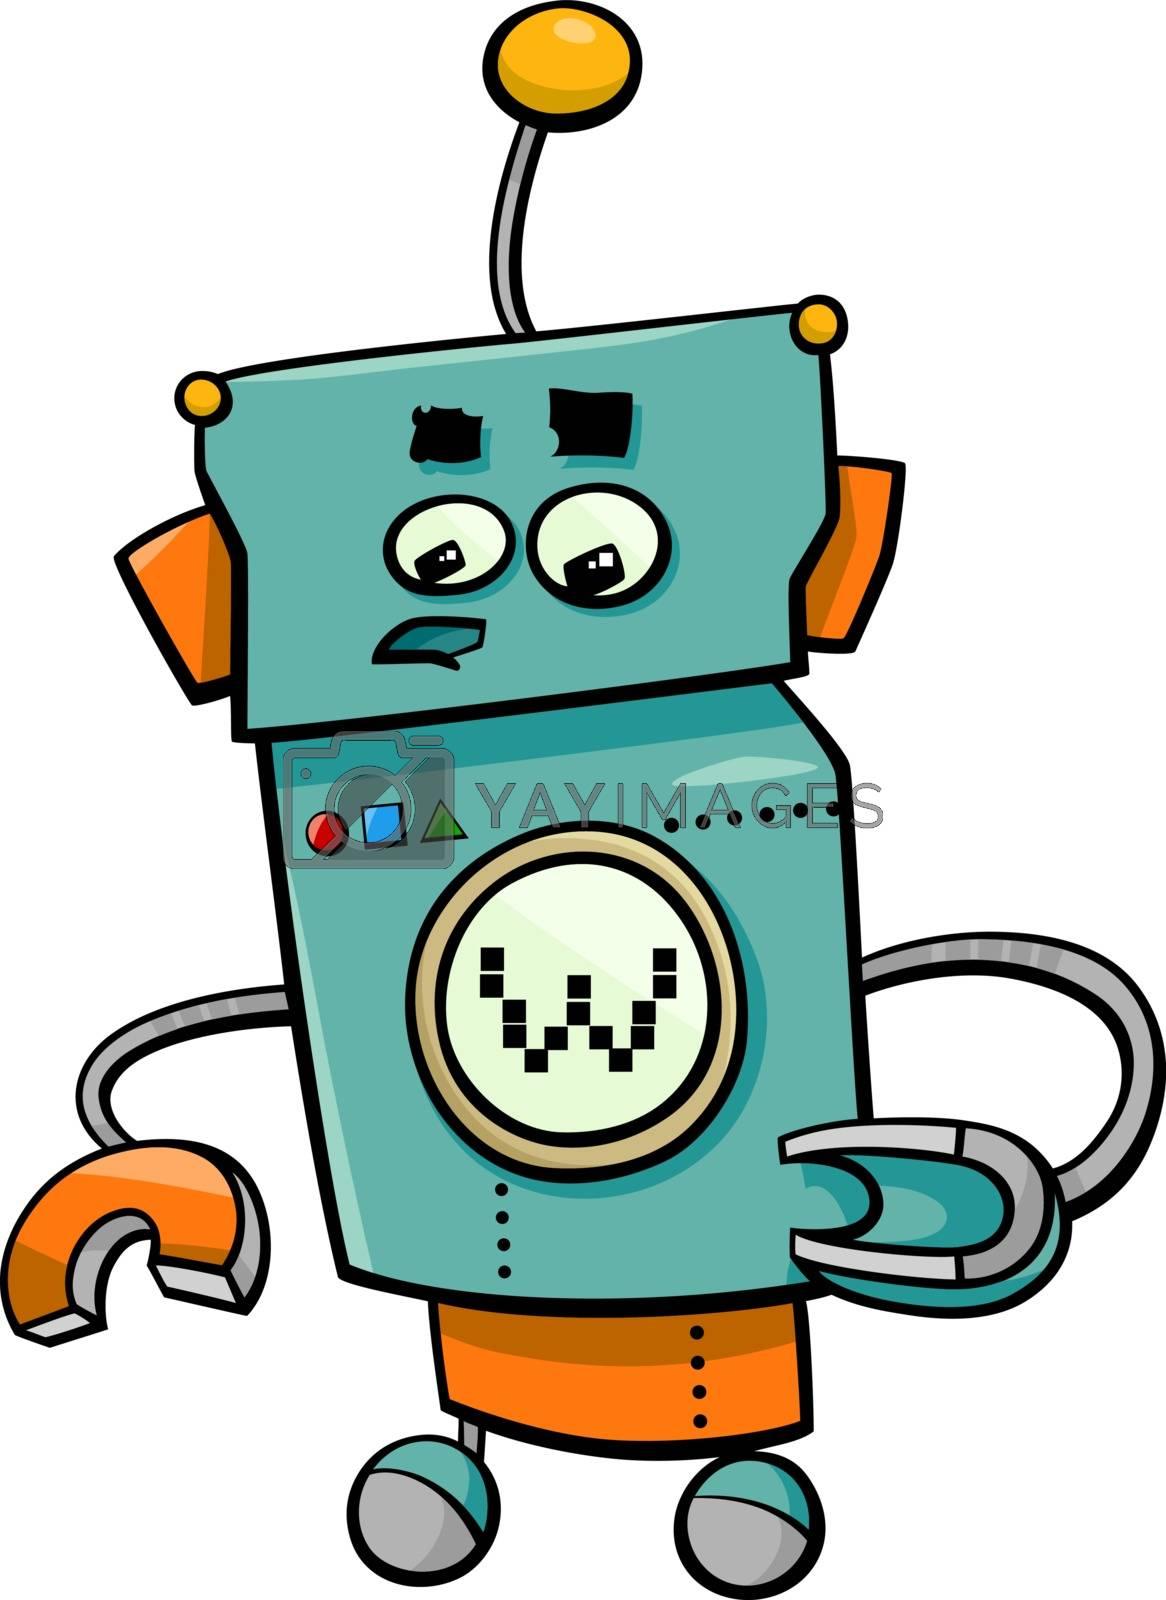 Royalty free image of comic robot cartoon character by izakowski